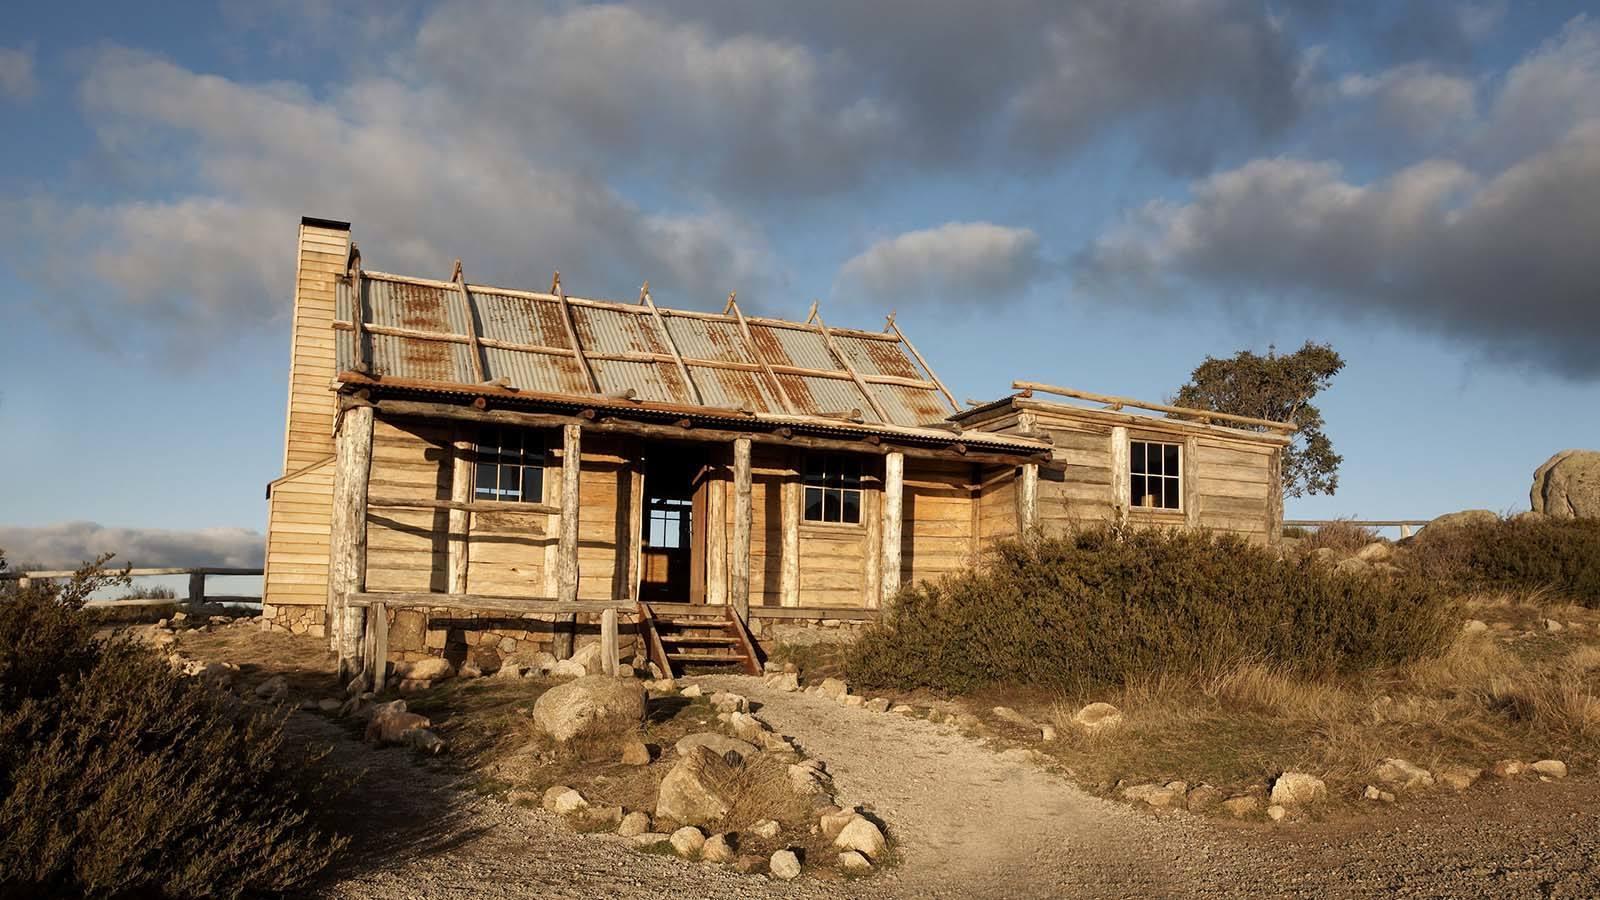 Craig's Hut, High Country, Victoria, Australia